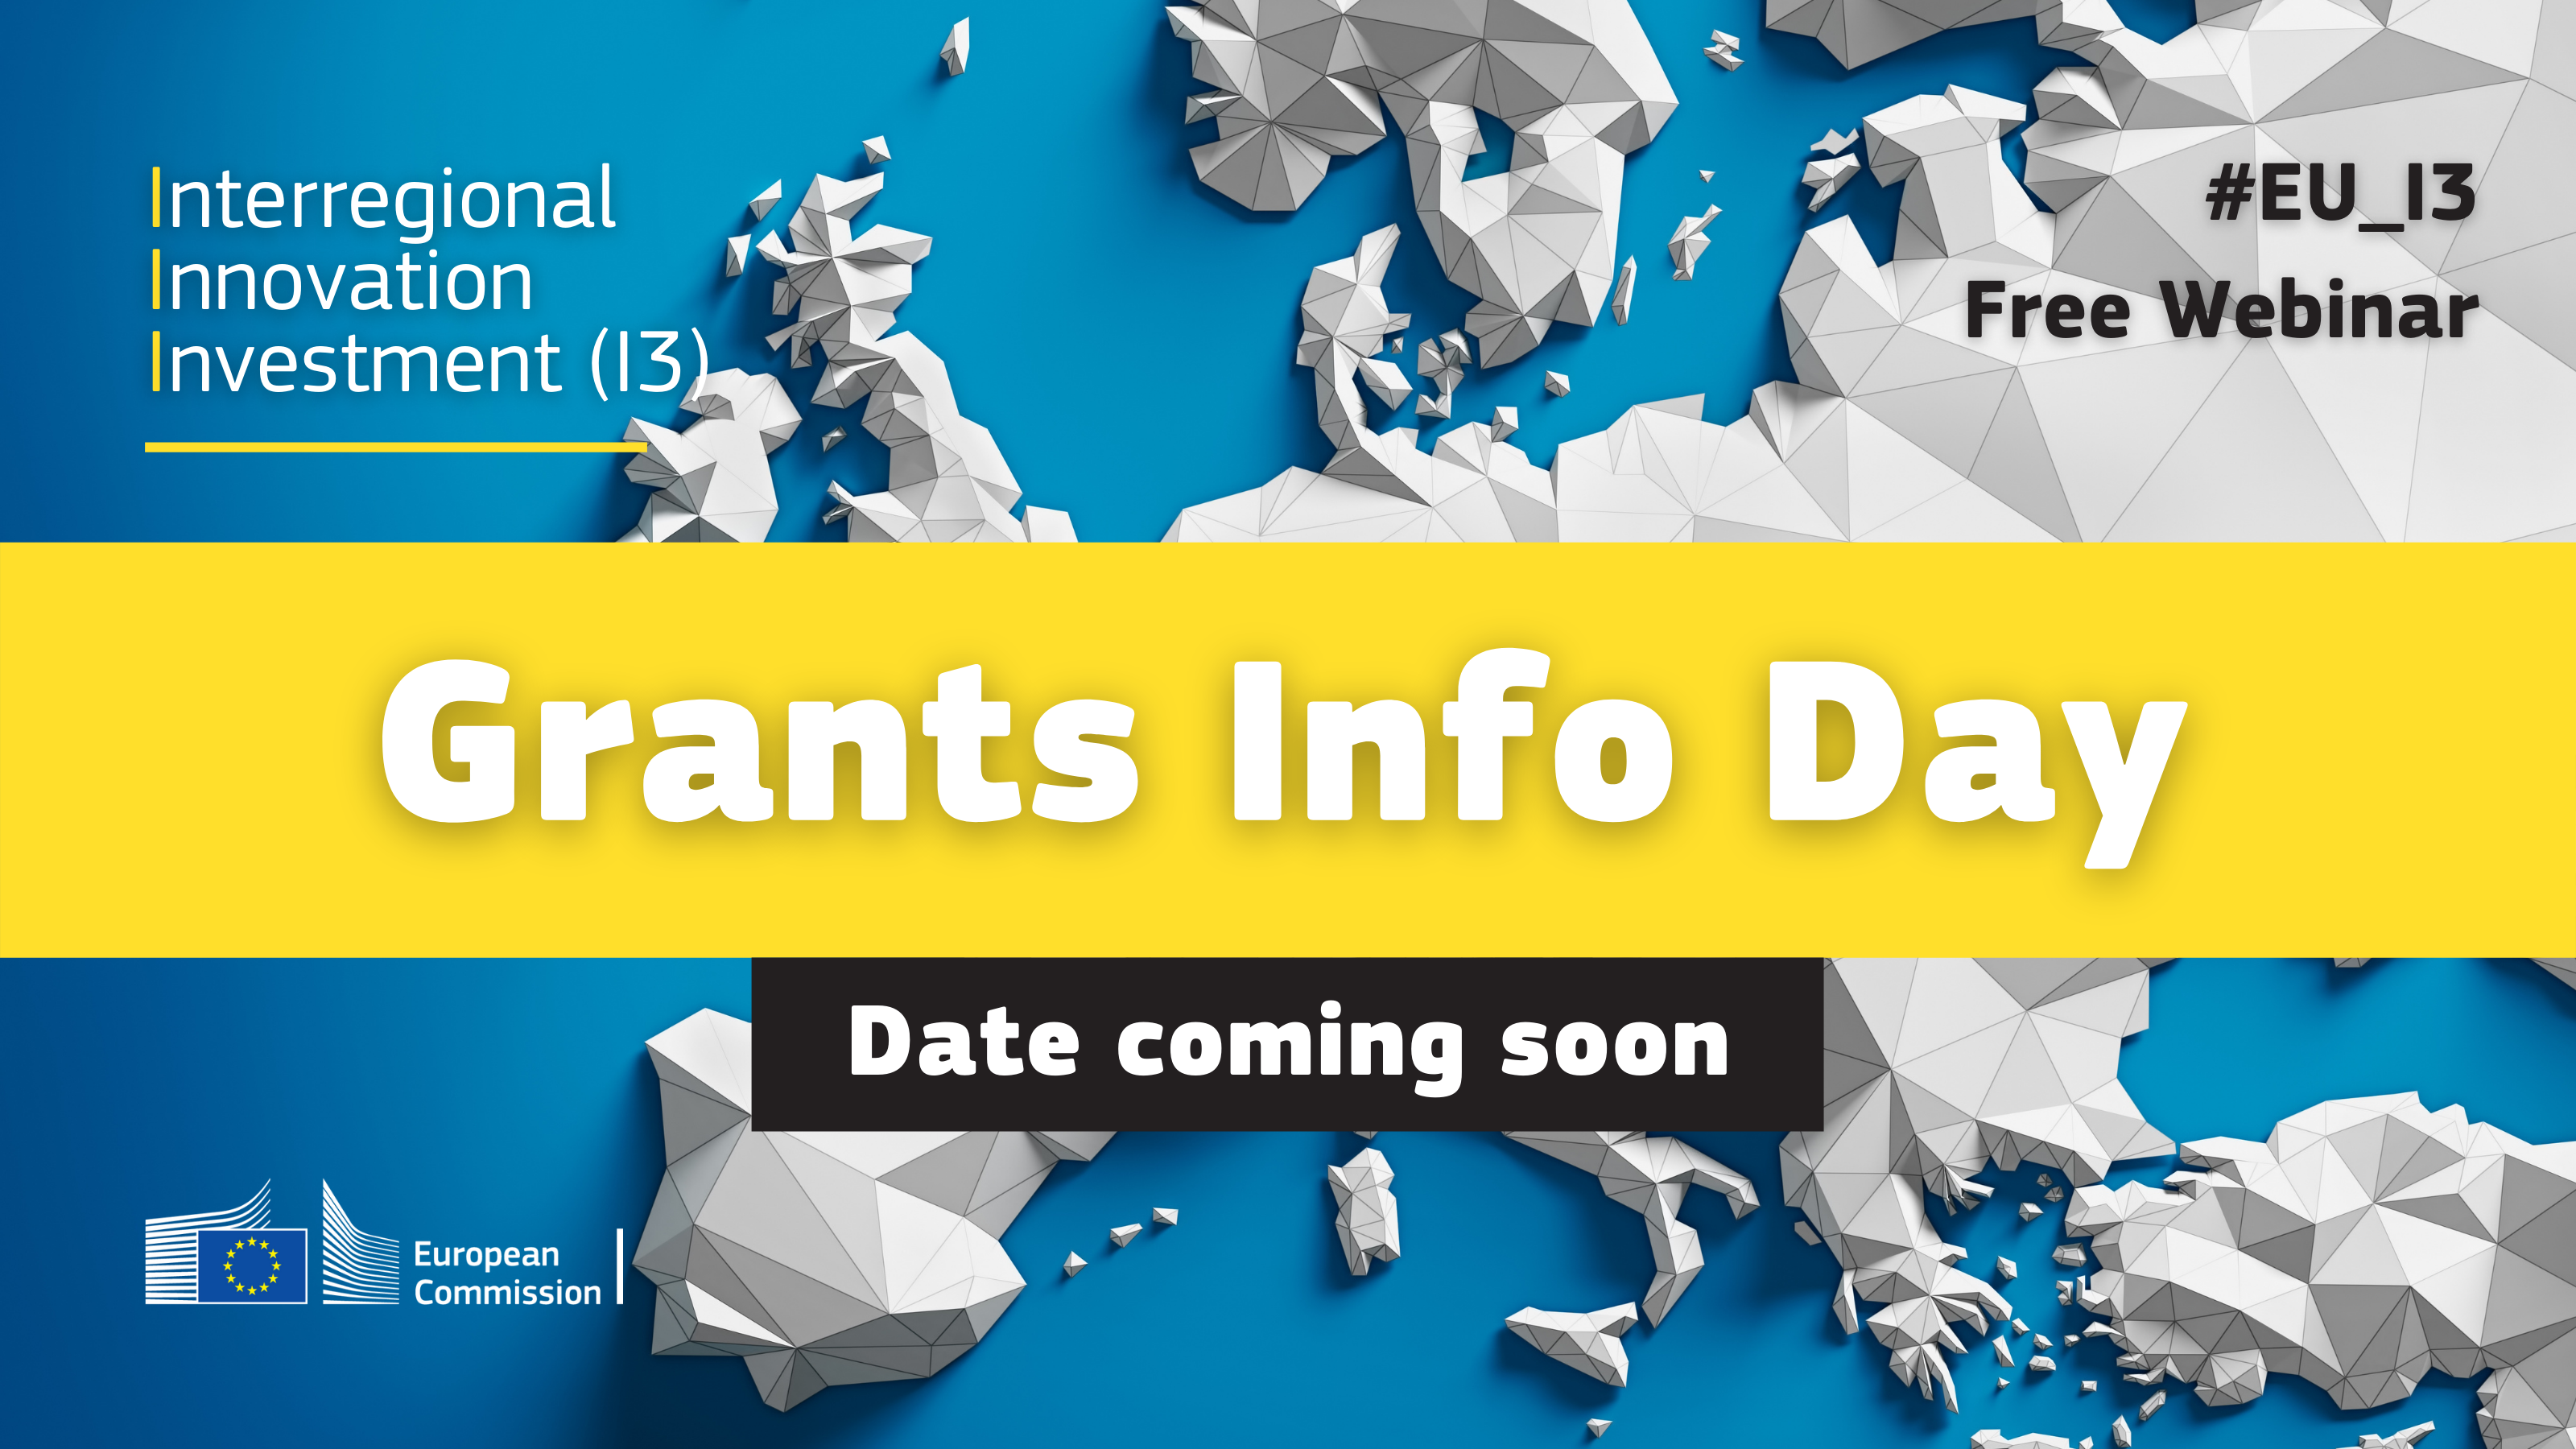 Interregional Innovation Investment Info Day